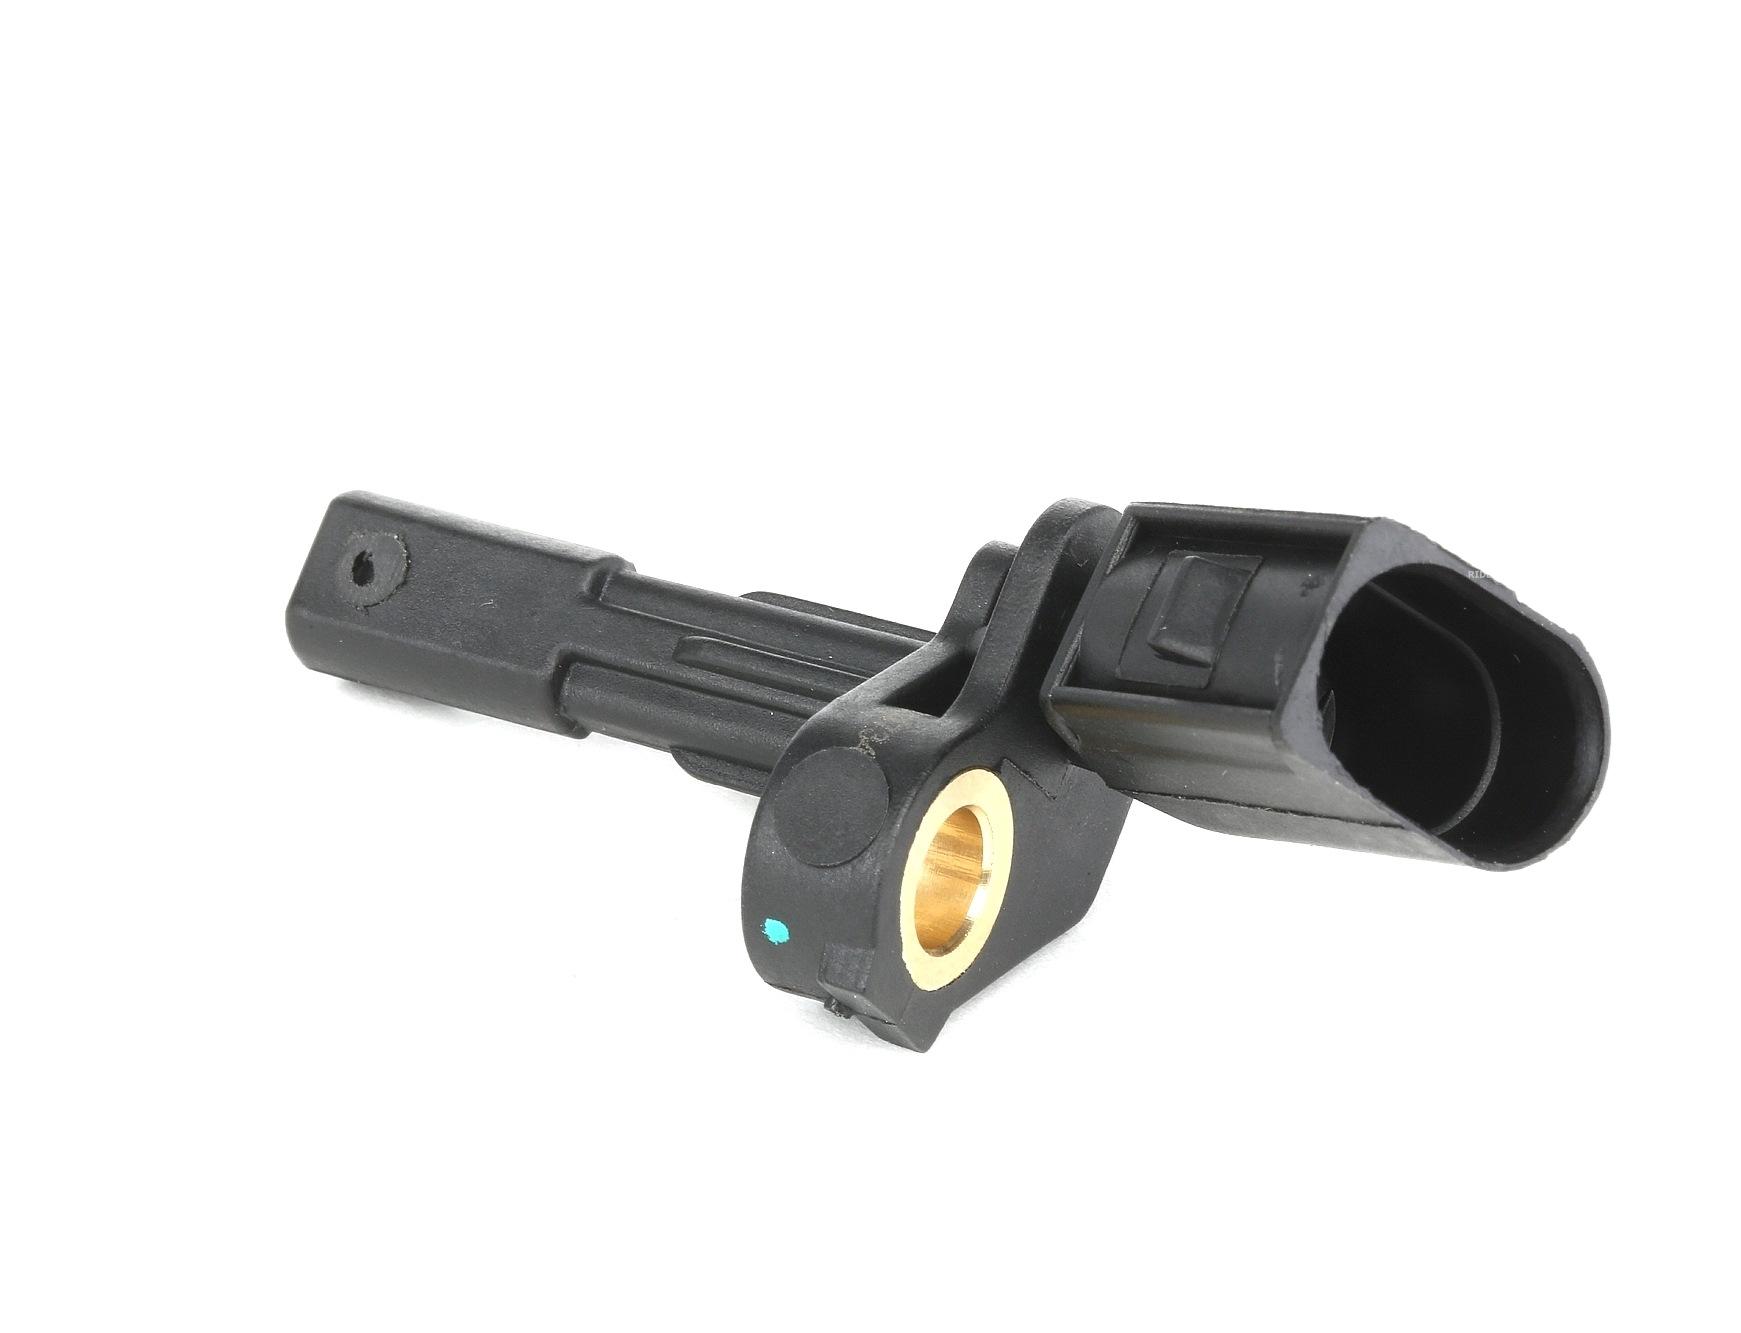 Original MINI ABS Sensor 412W0007